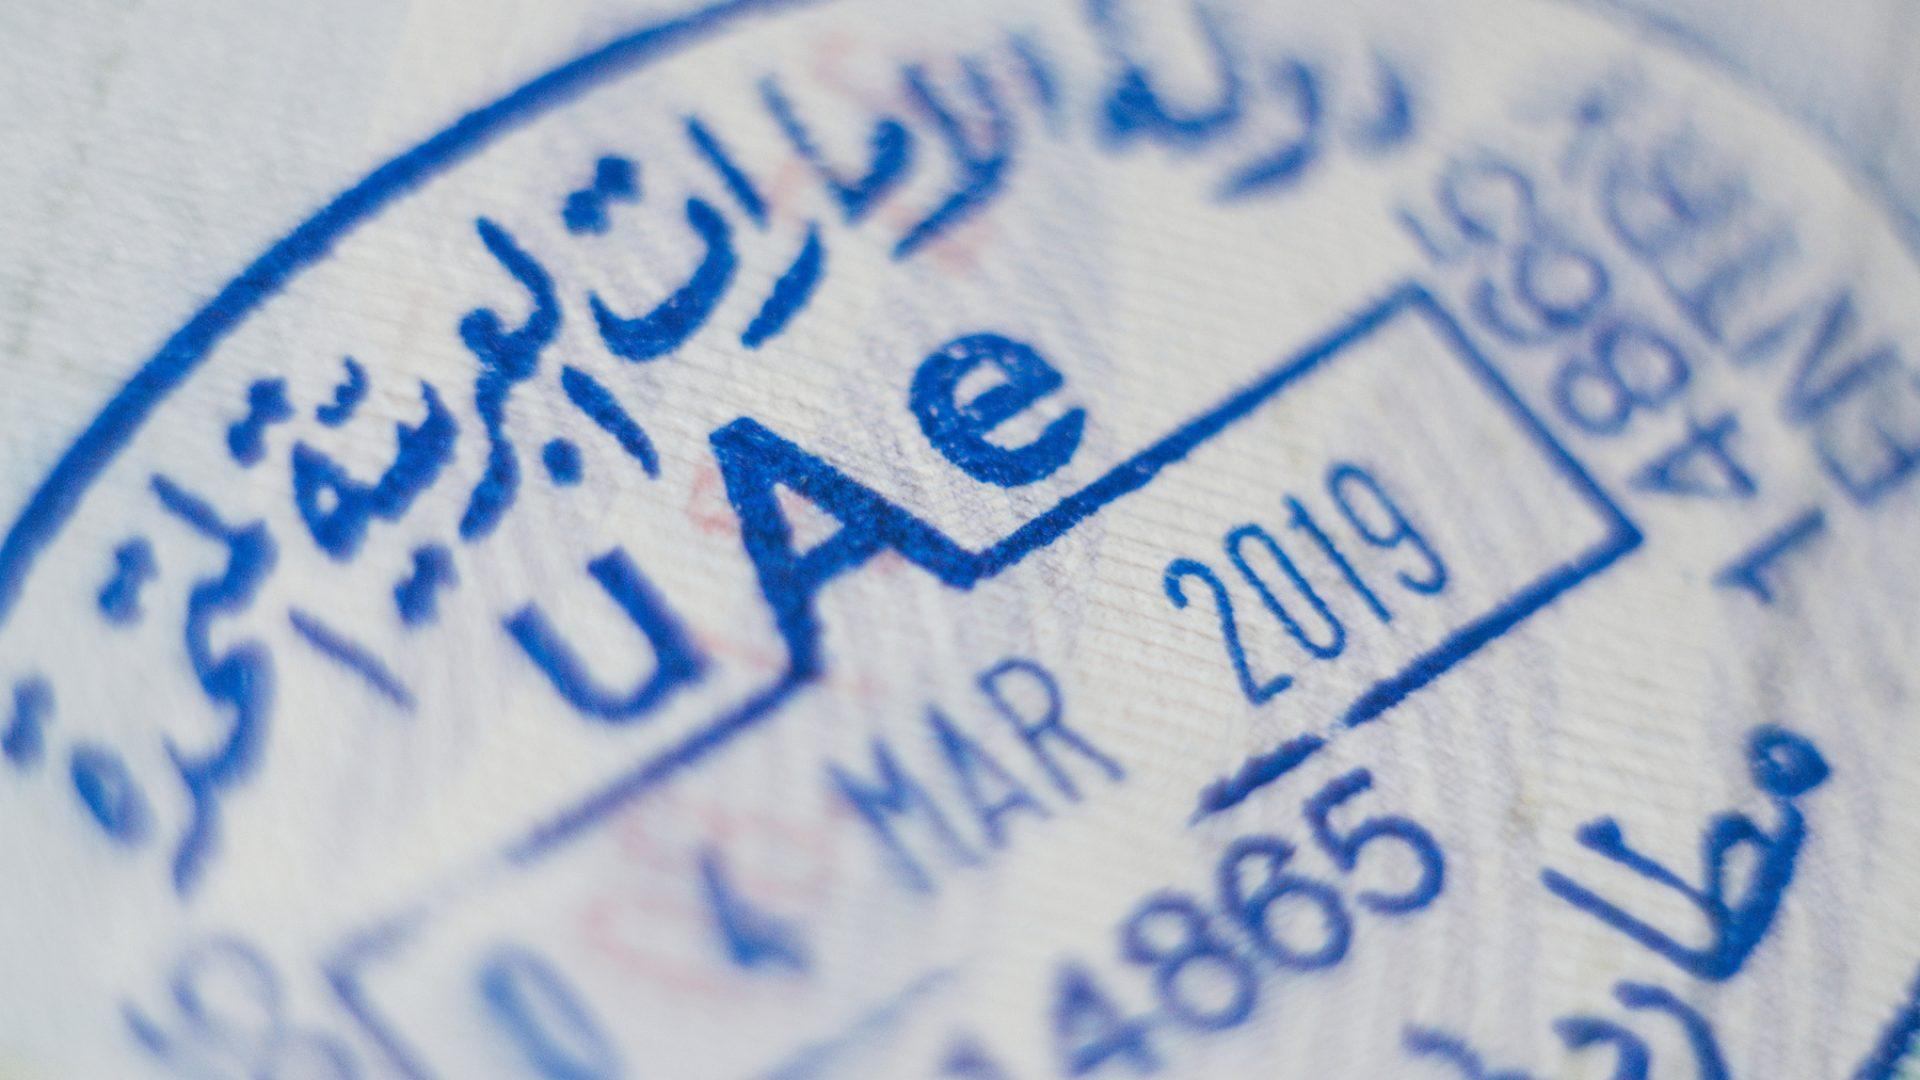 UAE work visa